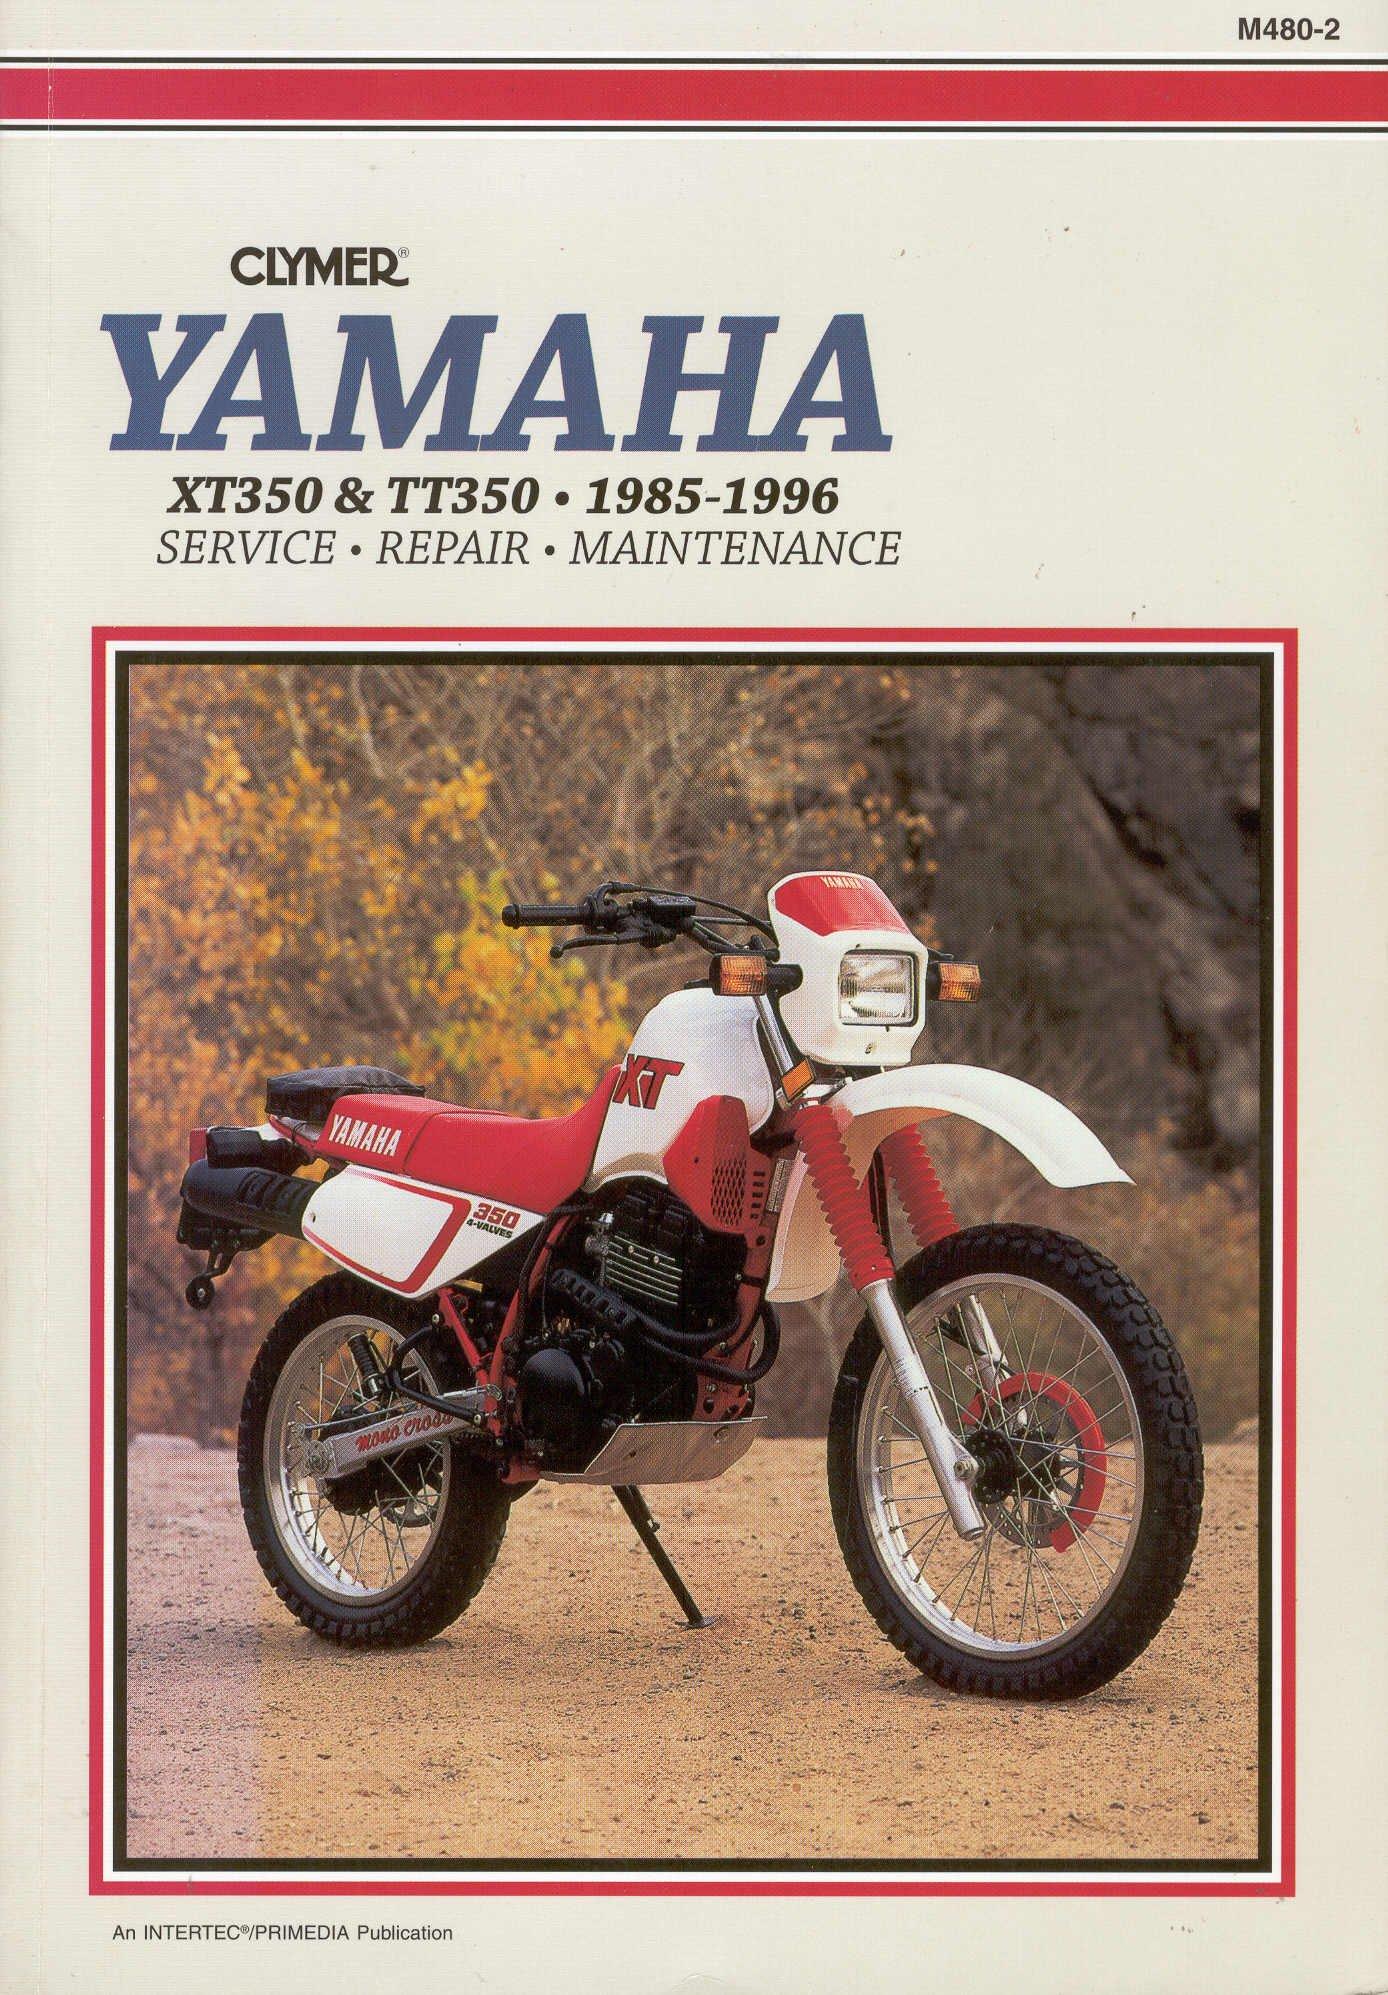 Yamaha XT/TT 350, 1985-1996: Service, Repair, Maintenance: Ron Wright:  9780892876990: Amazon.com: Books